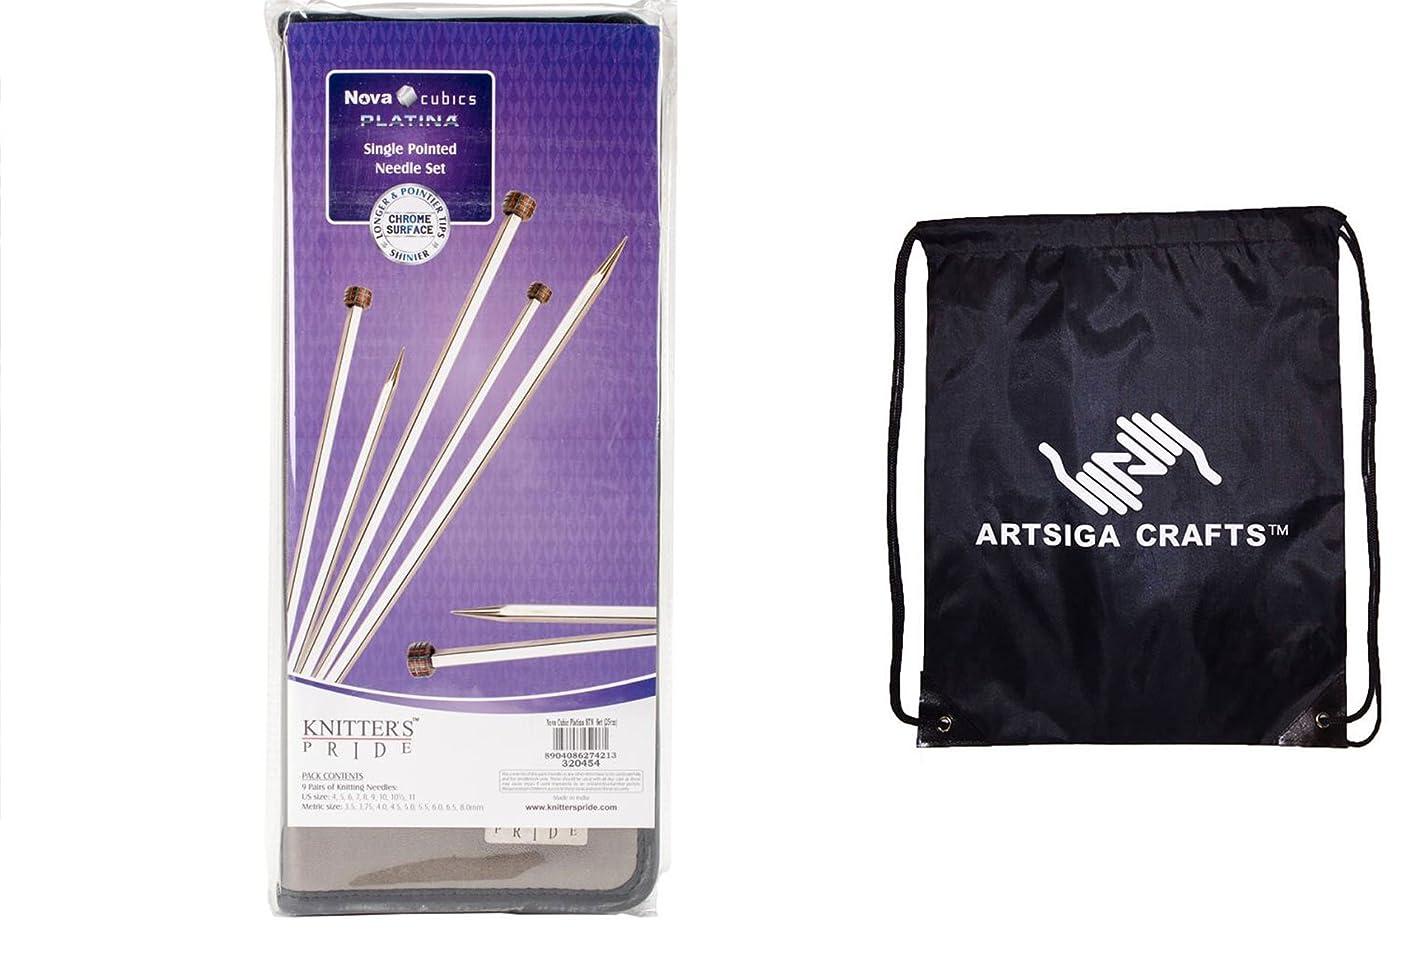 Knitter's Pride Nova Cubics Platina 10-inch (25cm) Single Pointed Knitting Needles Set Bundle with 1 Artsiga Crafts Project Bag 320454